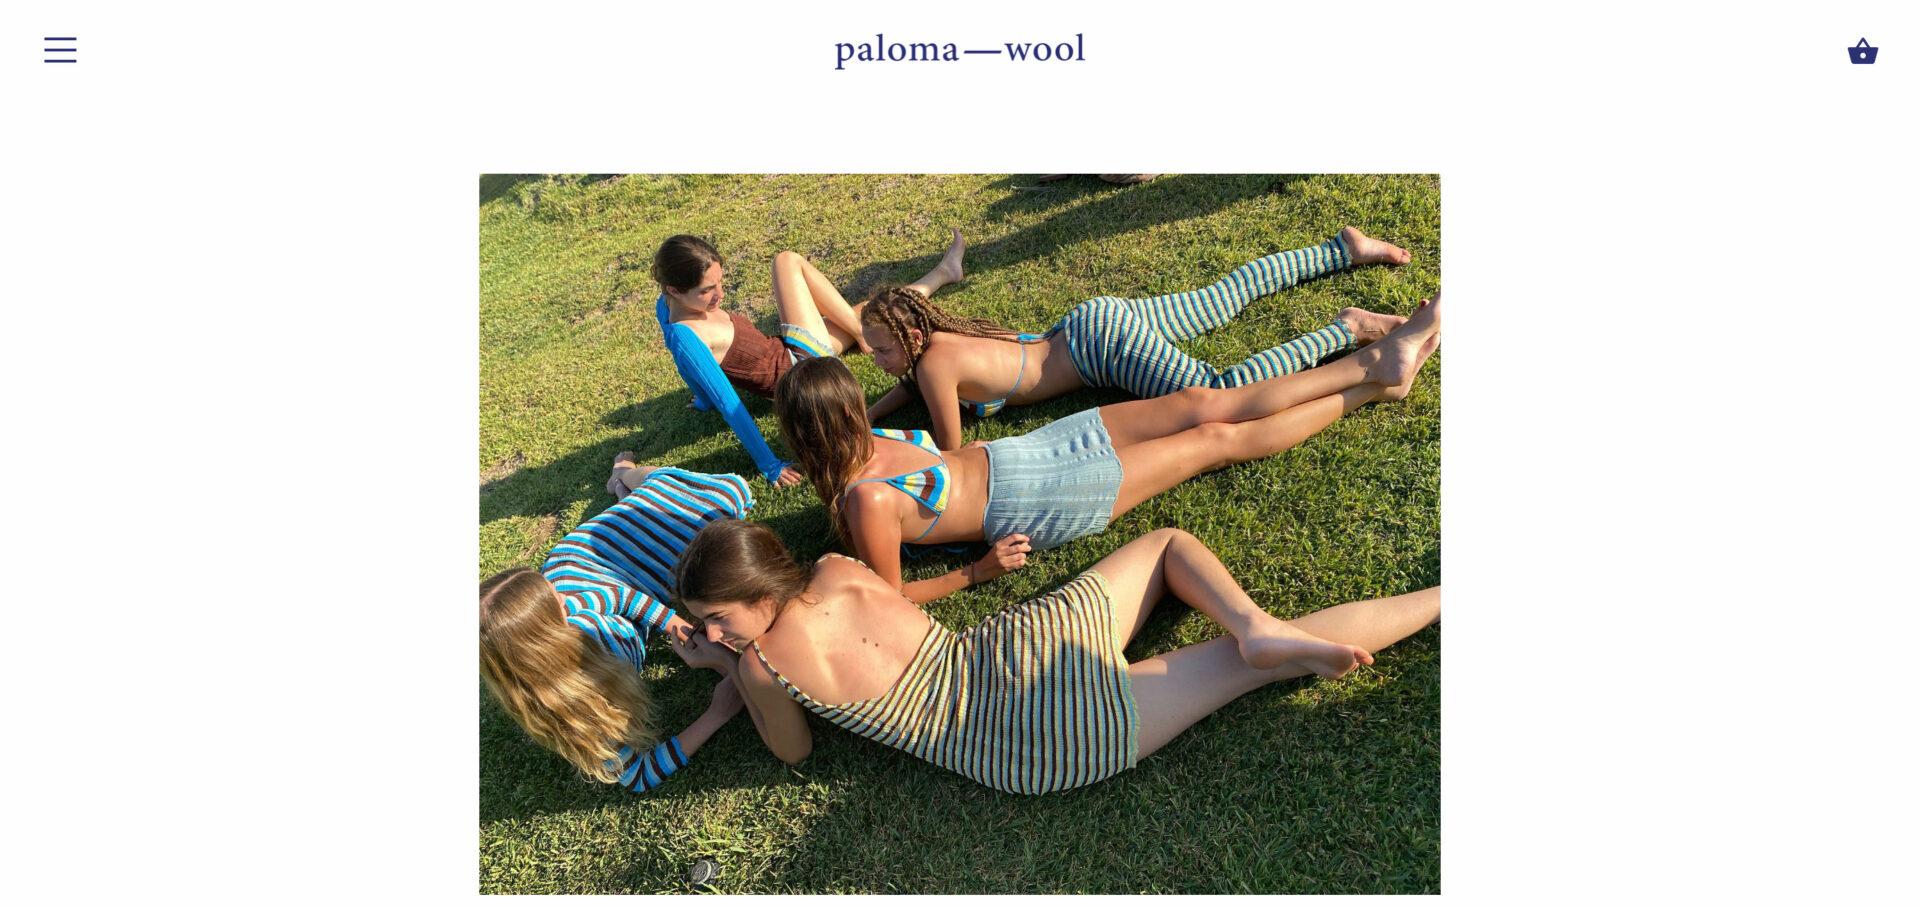 paloma wool パロマウールの海外通販